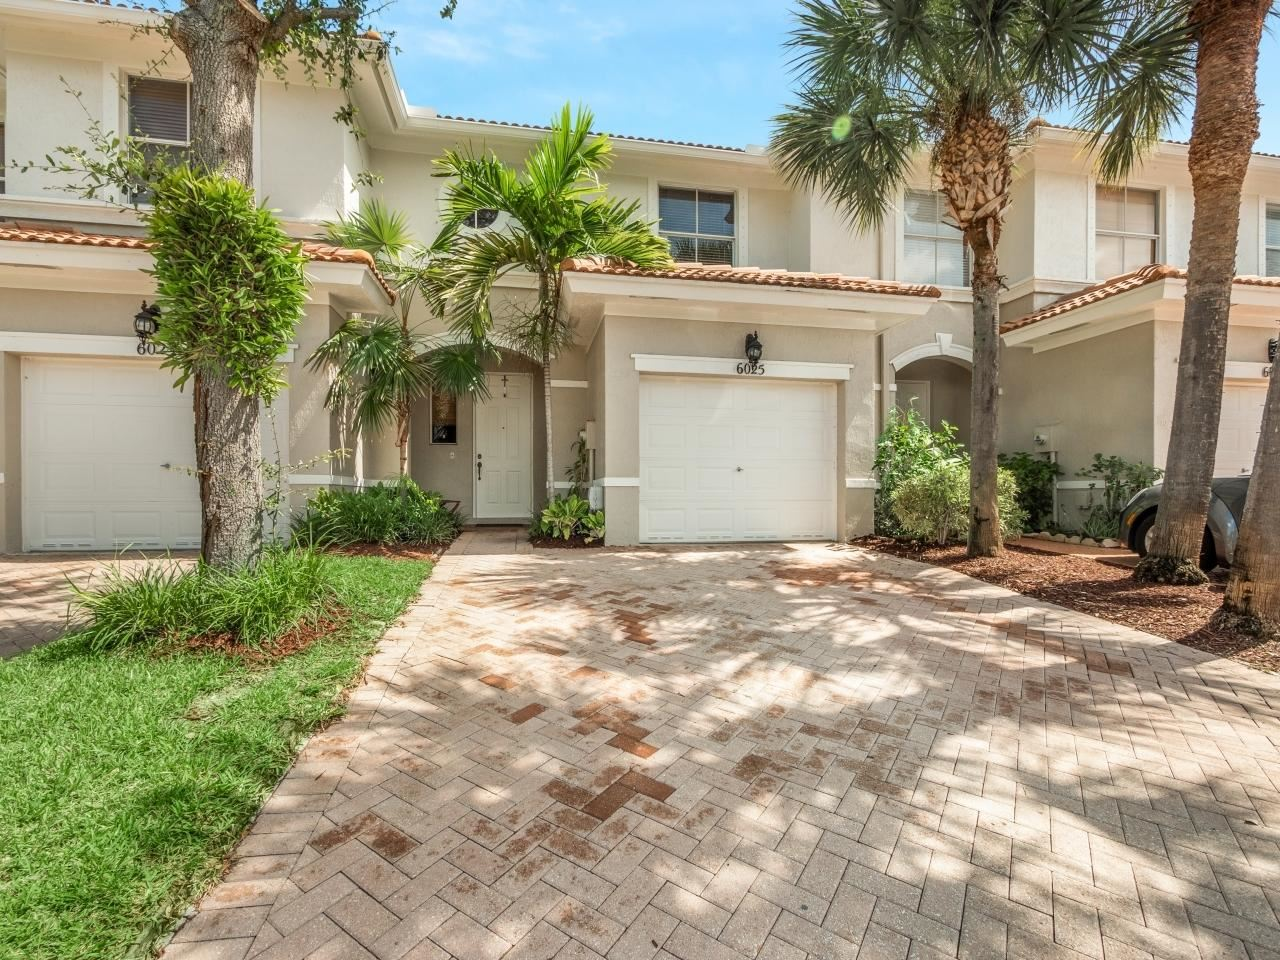 6025 Seminole Gardens Circle, Riviera Beach, FL 33418 - MLS#: RX-10734639